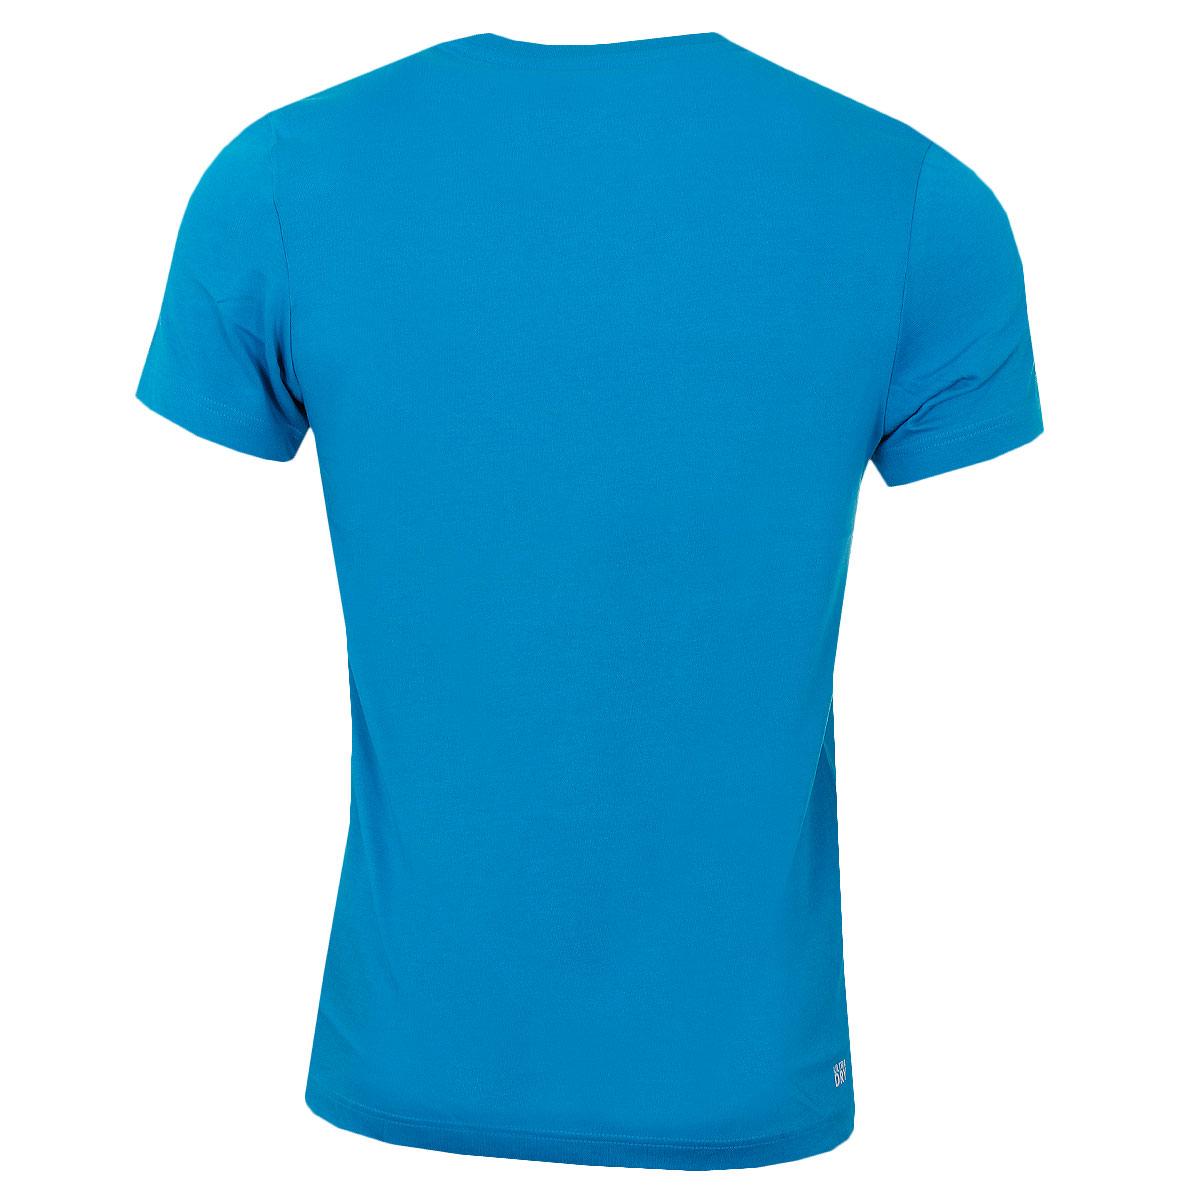 Lacoste-Mens-Oversized-Crocodile-Ultra-Dry-Cotton-Blend-T-Shirt-30-OFF-RRP thumbnail 18